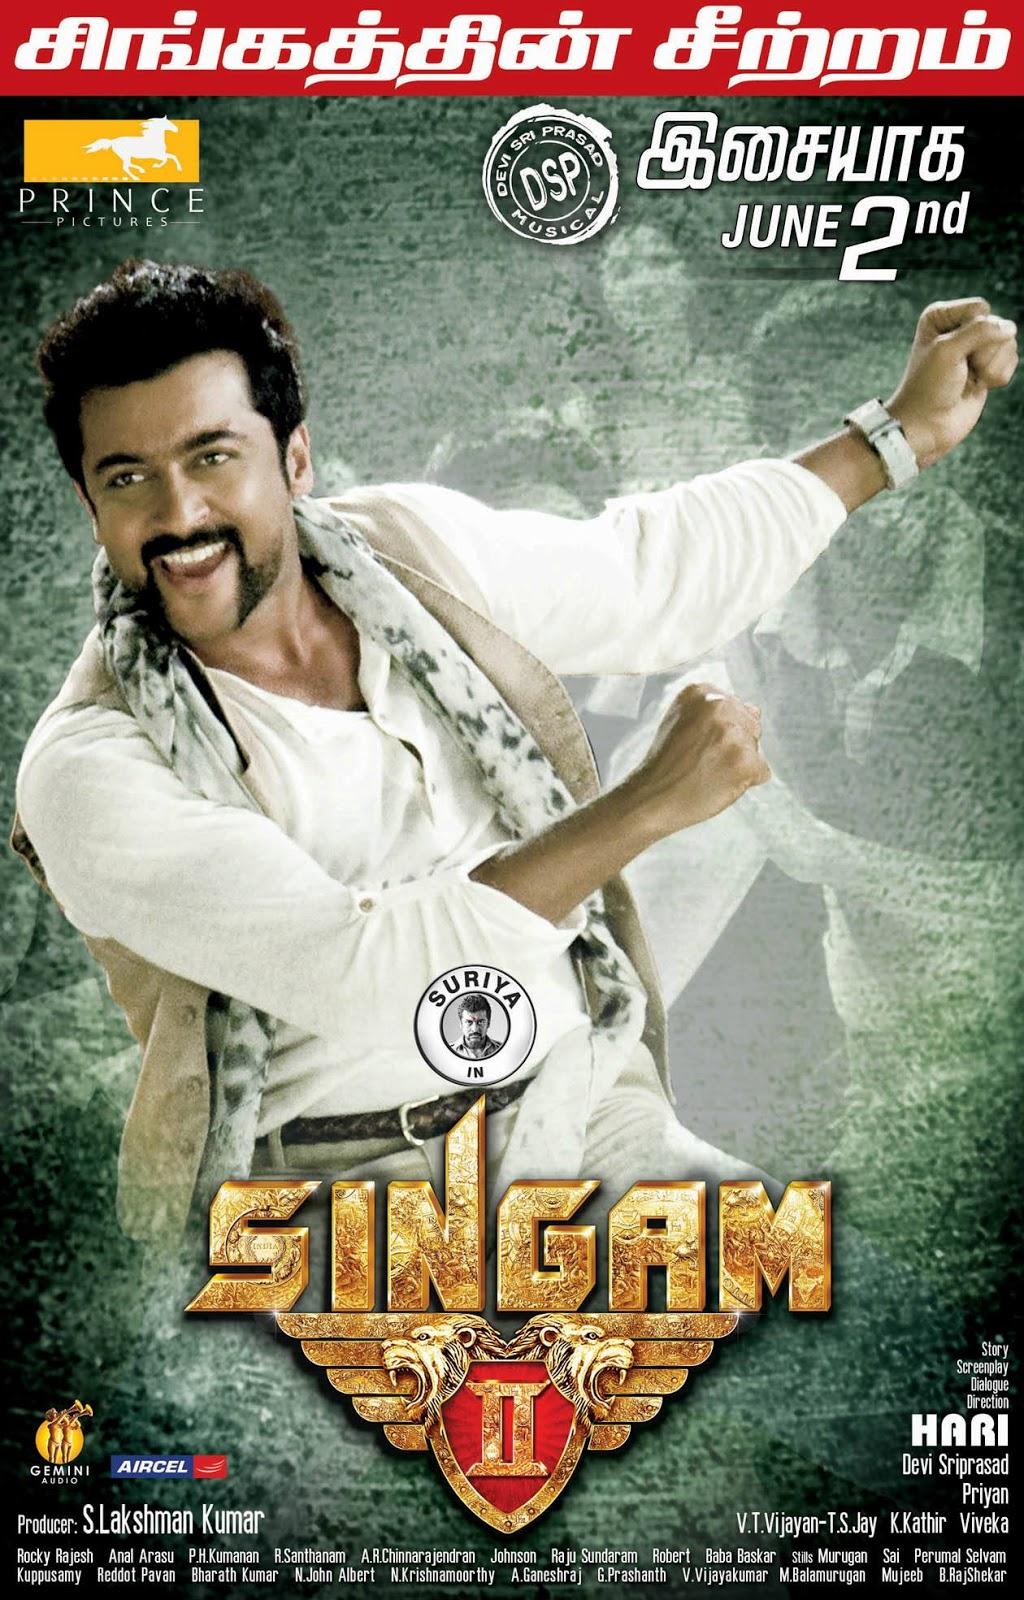 Tamil actor surya singam2 firstlook poster in english version tamil actor surya singam2 firstlook poster in english version thecheapjerseys Images